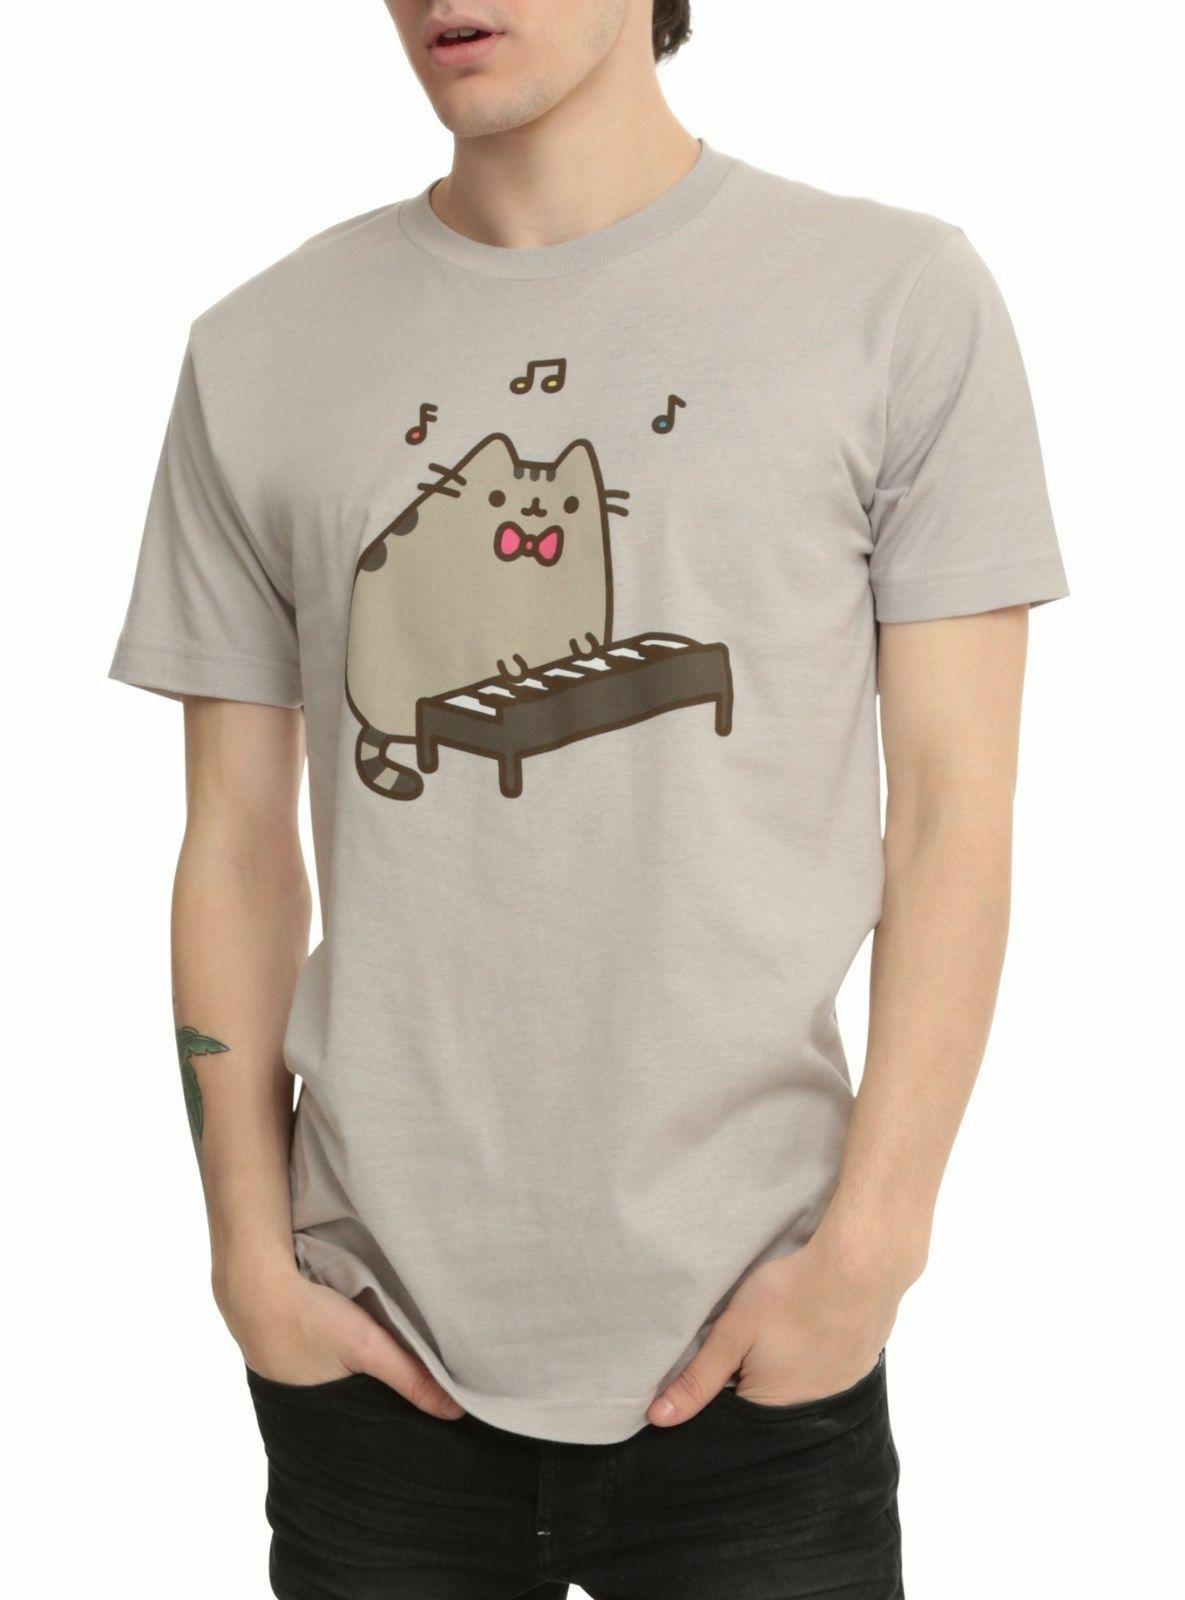 Pusheen Cat Balloons Unisex style Licensed T-Shirt